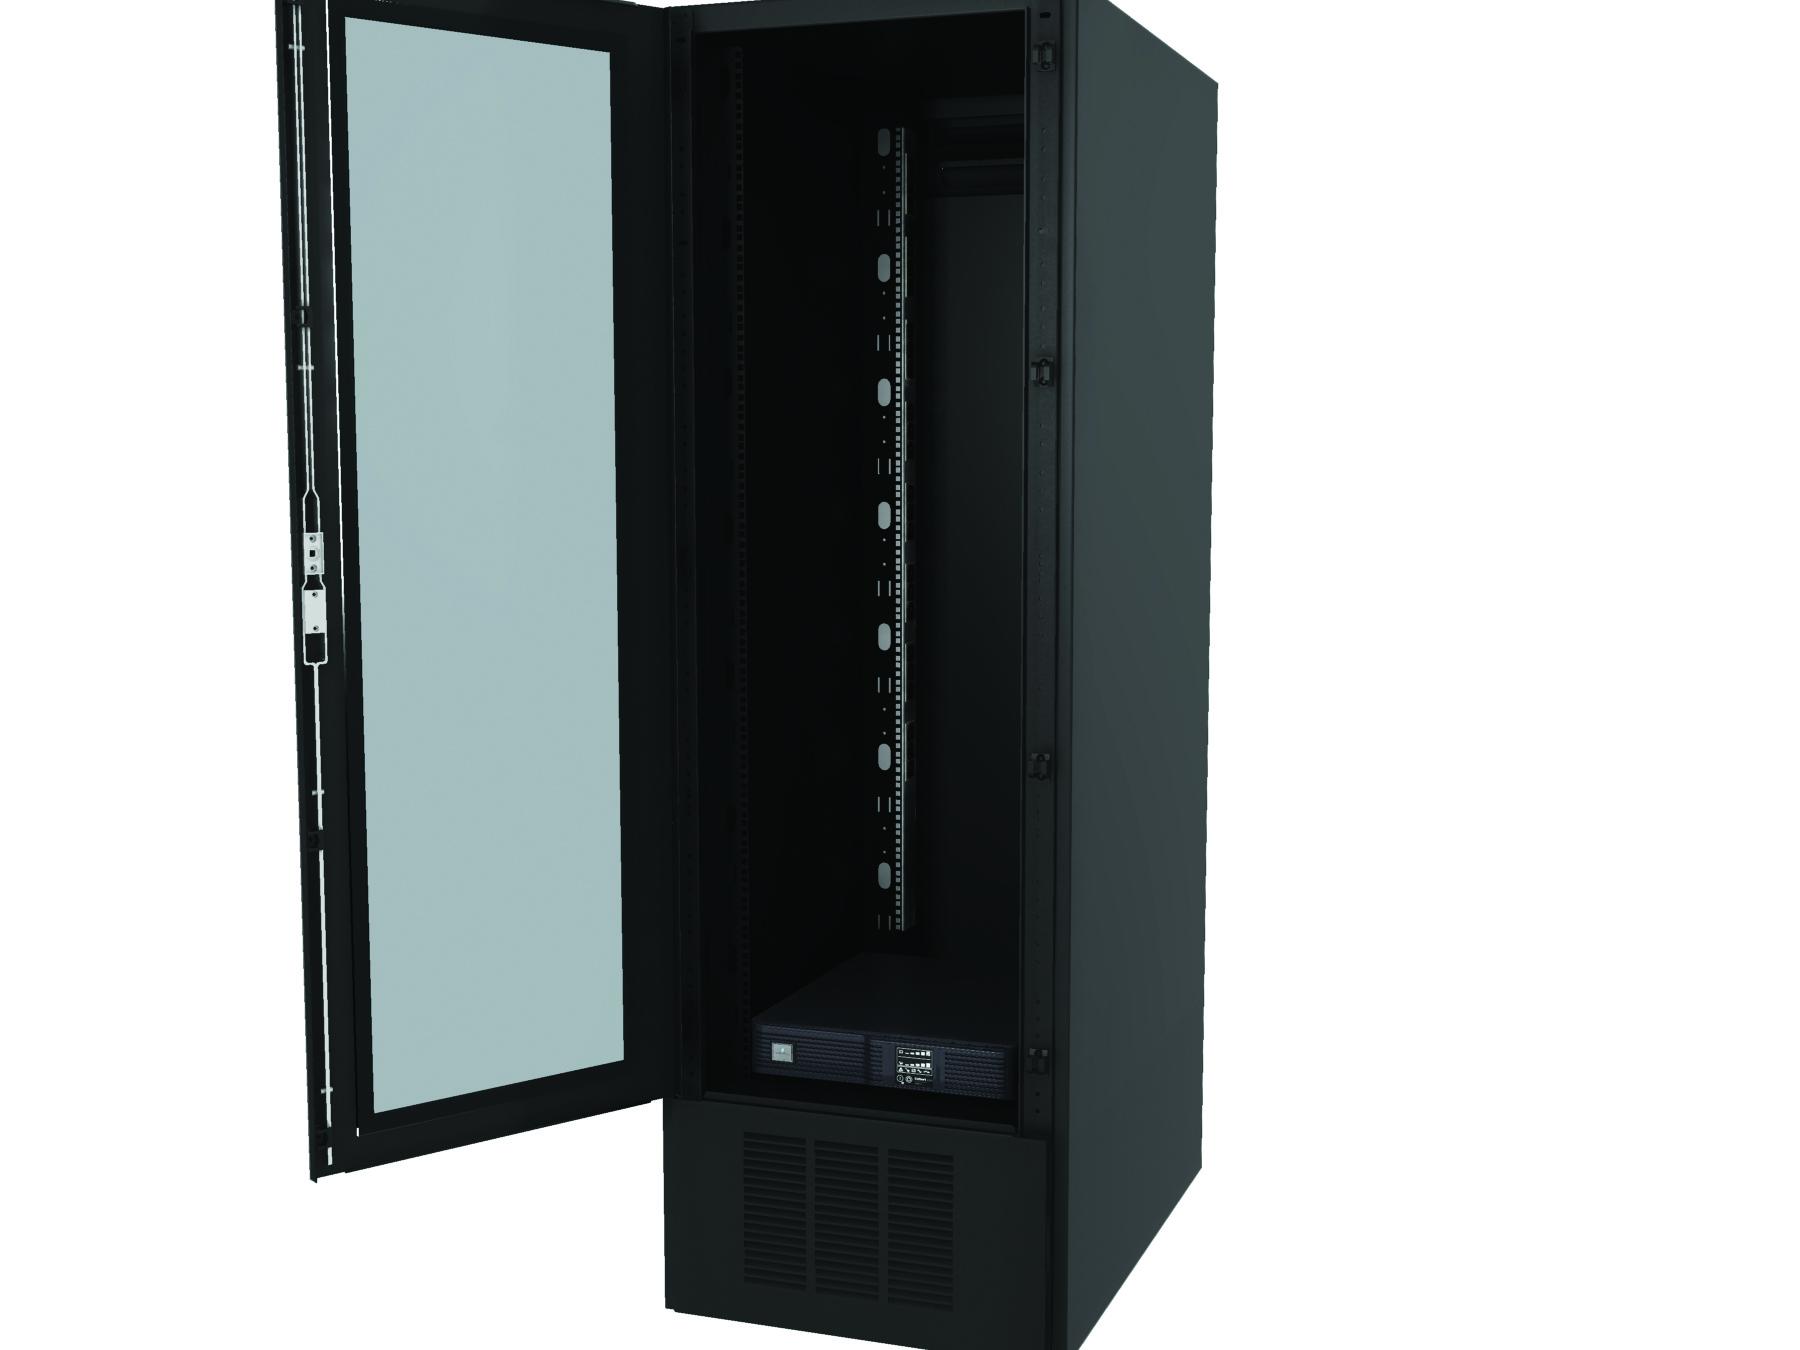 MCR (Mini-computer Room)